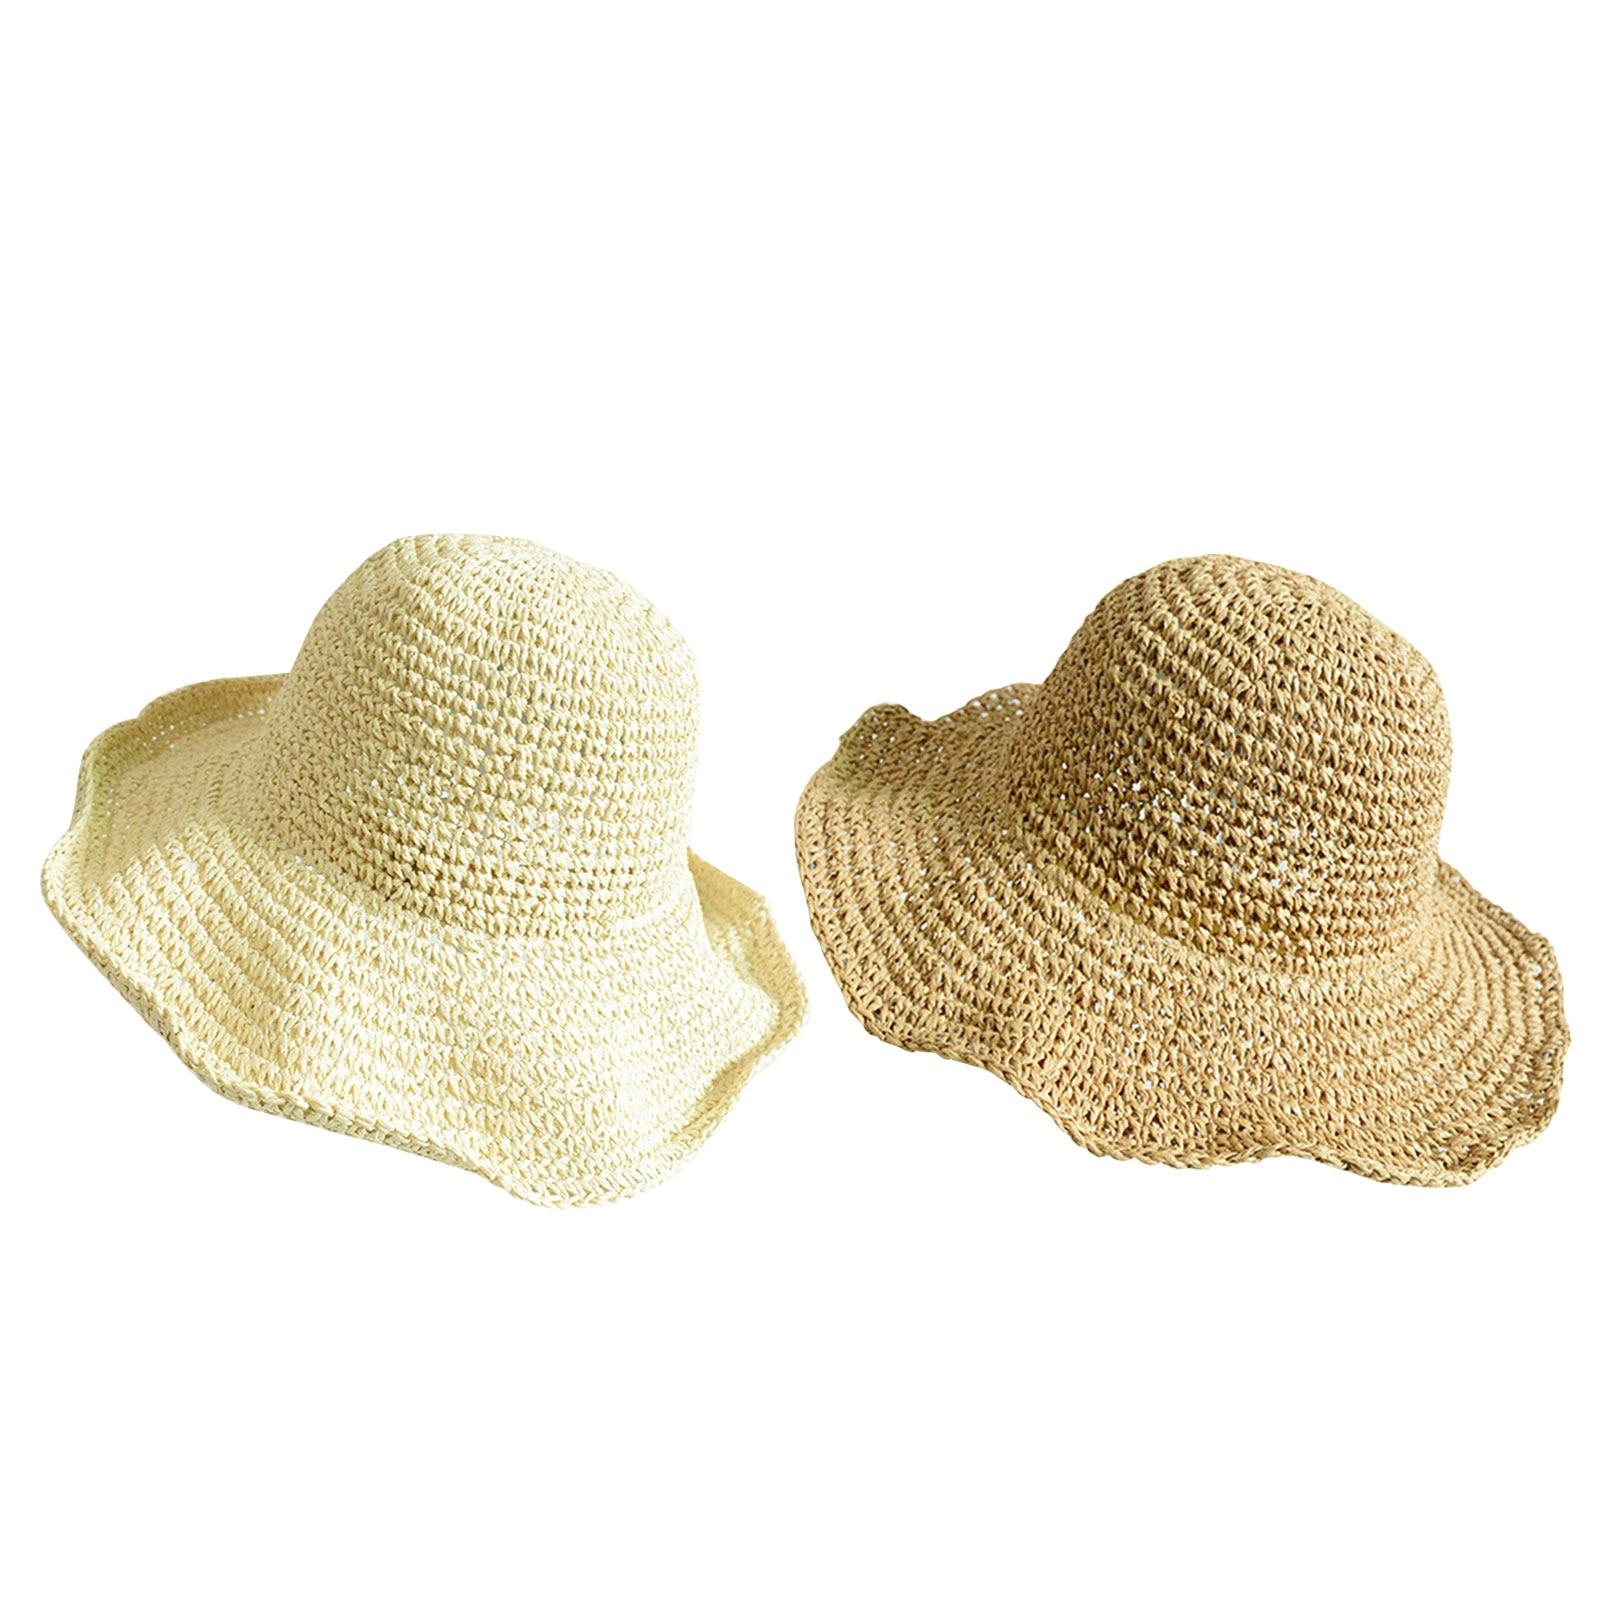 2021 New Girls Hand Made Sun Hat Kids Summer Raffia Straw Hat Big Brim Beach Cap Foldable Breathable Summer Parent-child Hat